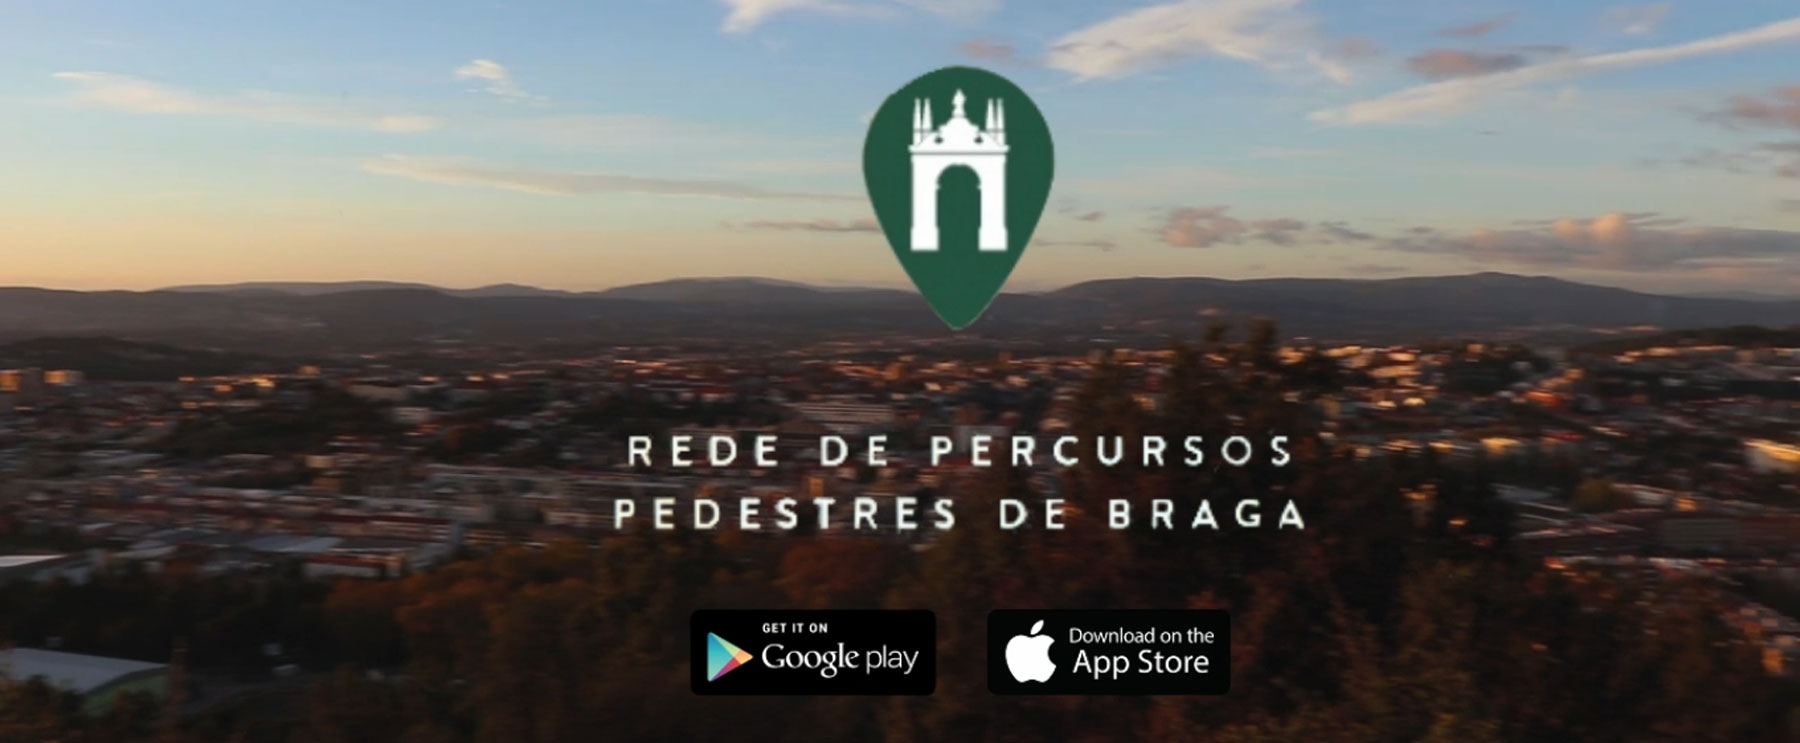 App: Rede de Percursos Pedestres de Braga